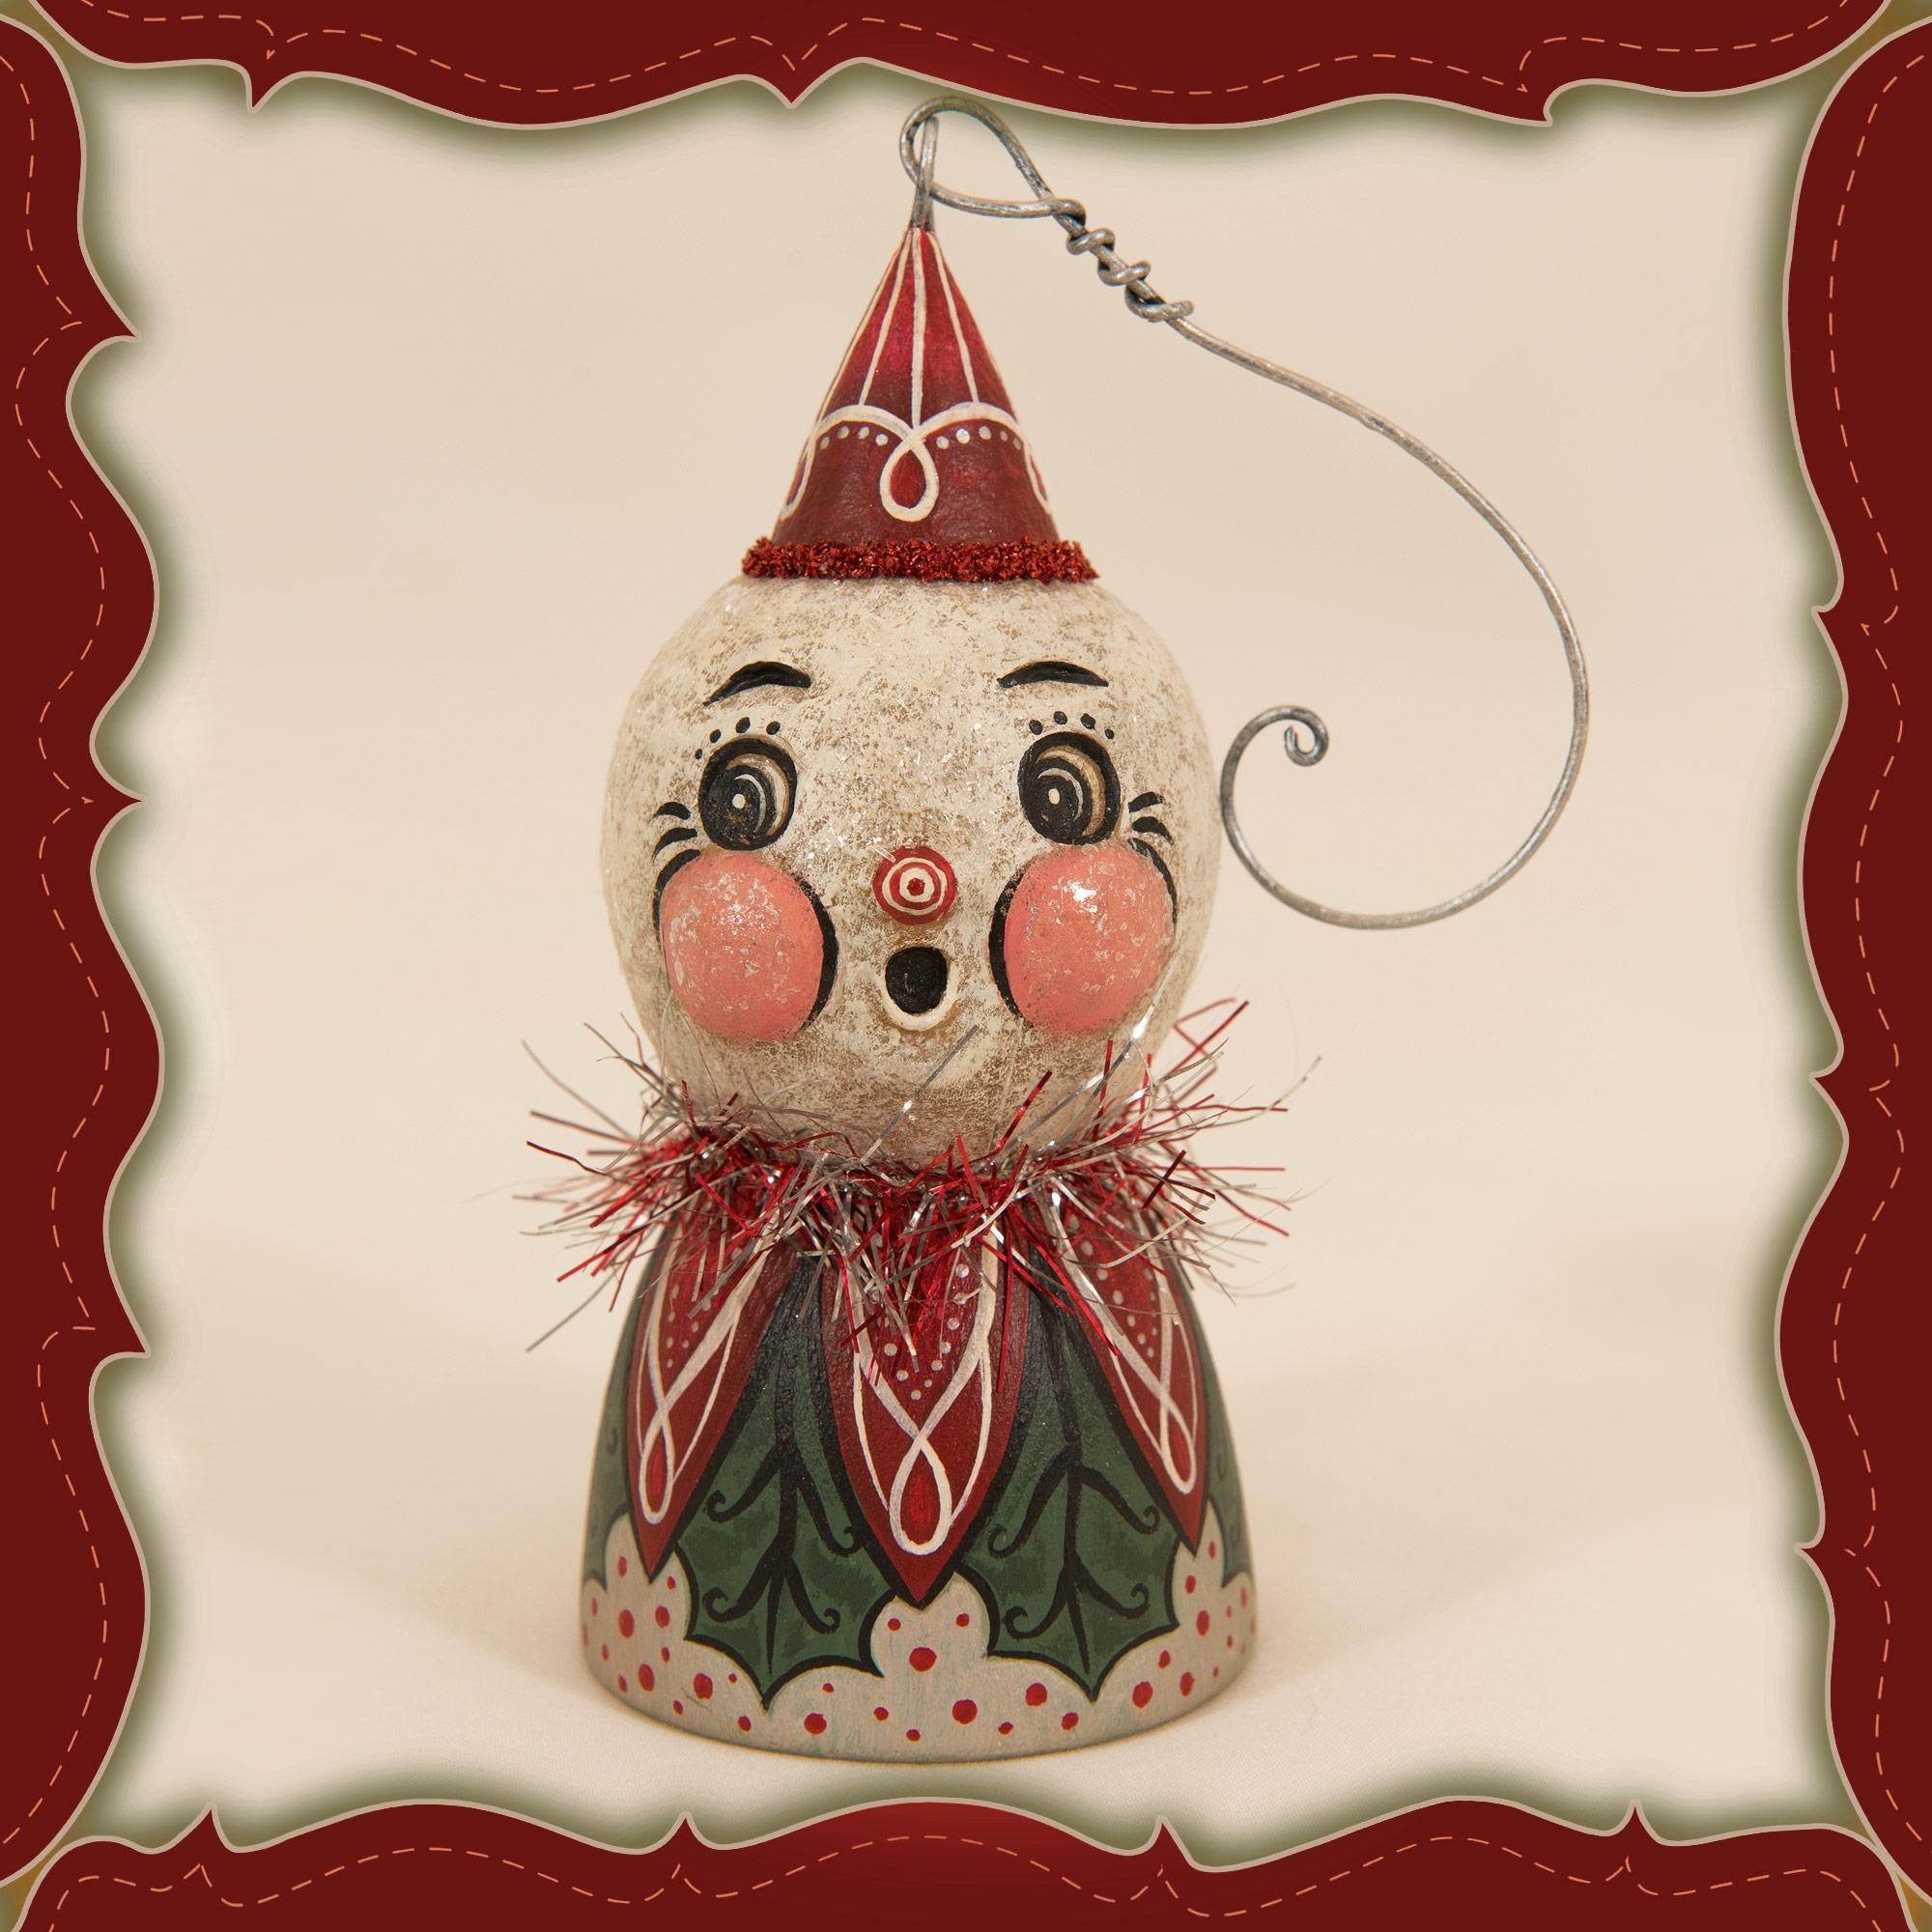 Johanna-Parker-Holly-Snowman-Bell-Ornament-Frame.jpg